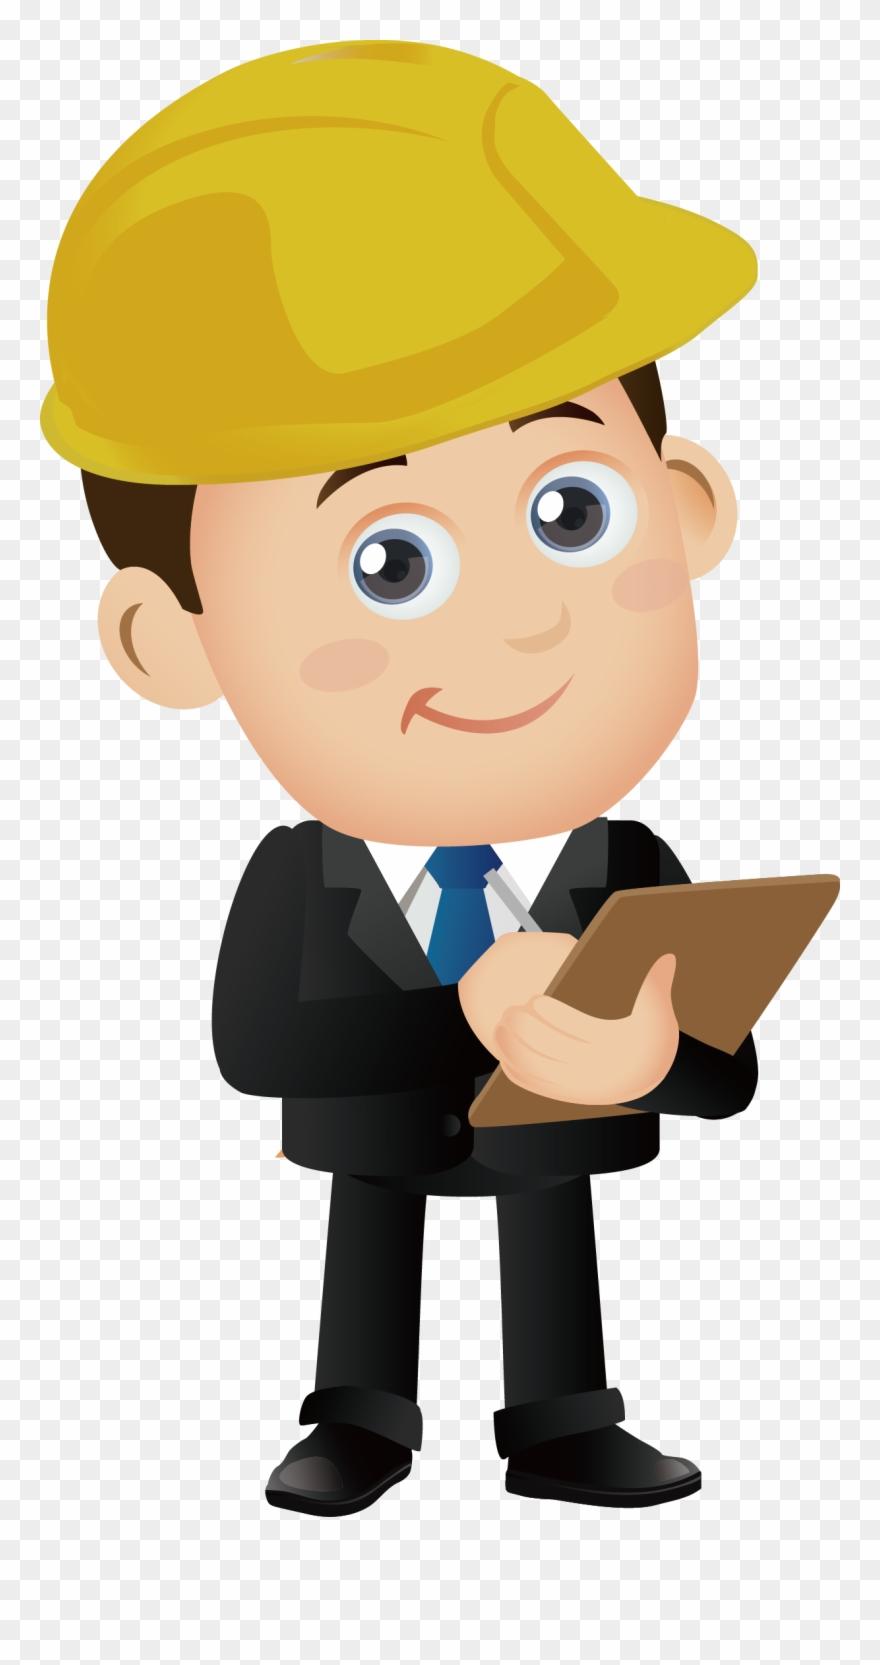 Engineer clipart computer engineer. Engineering png